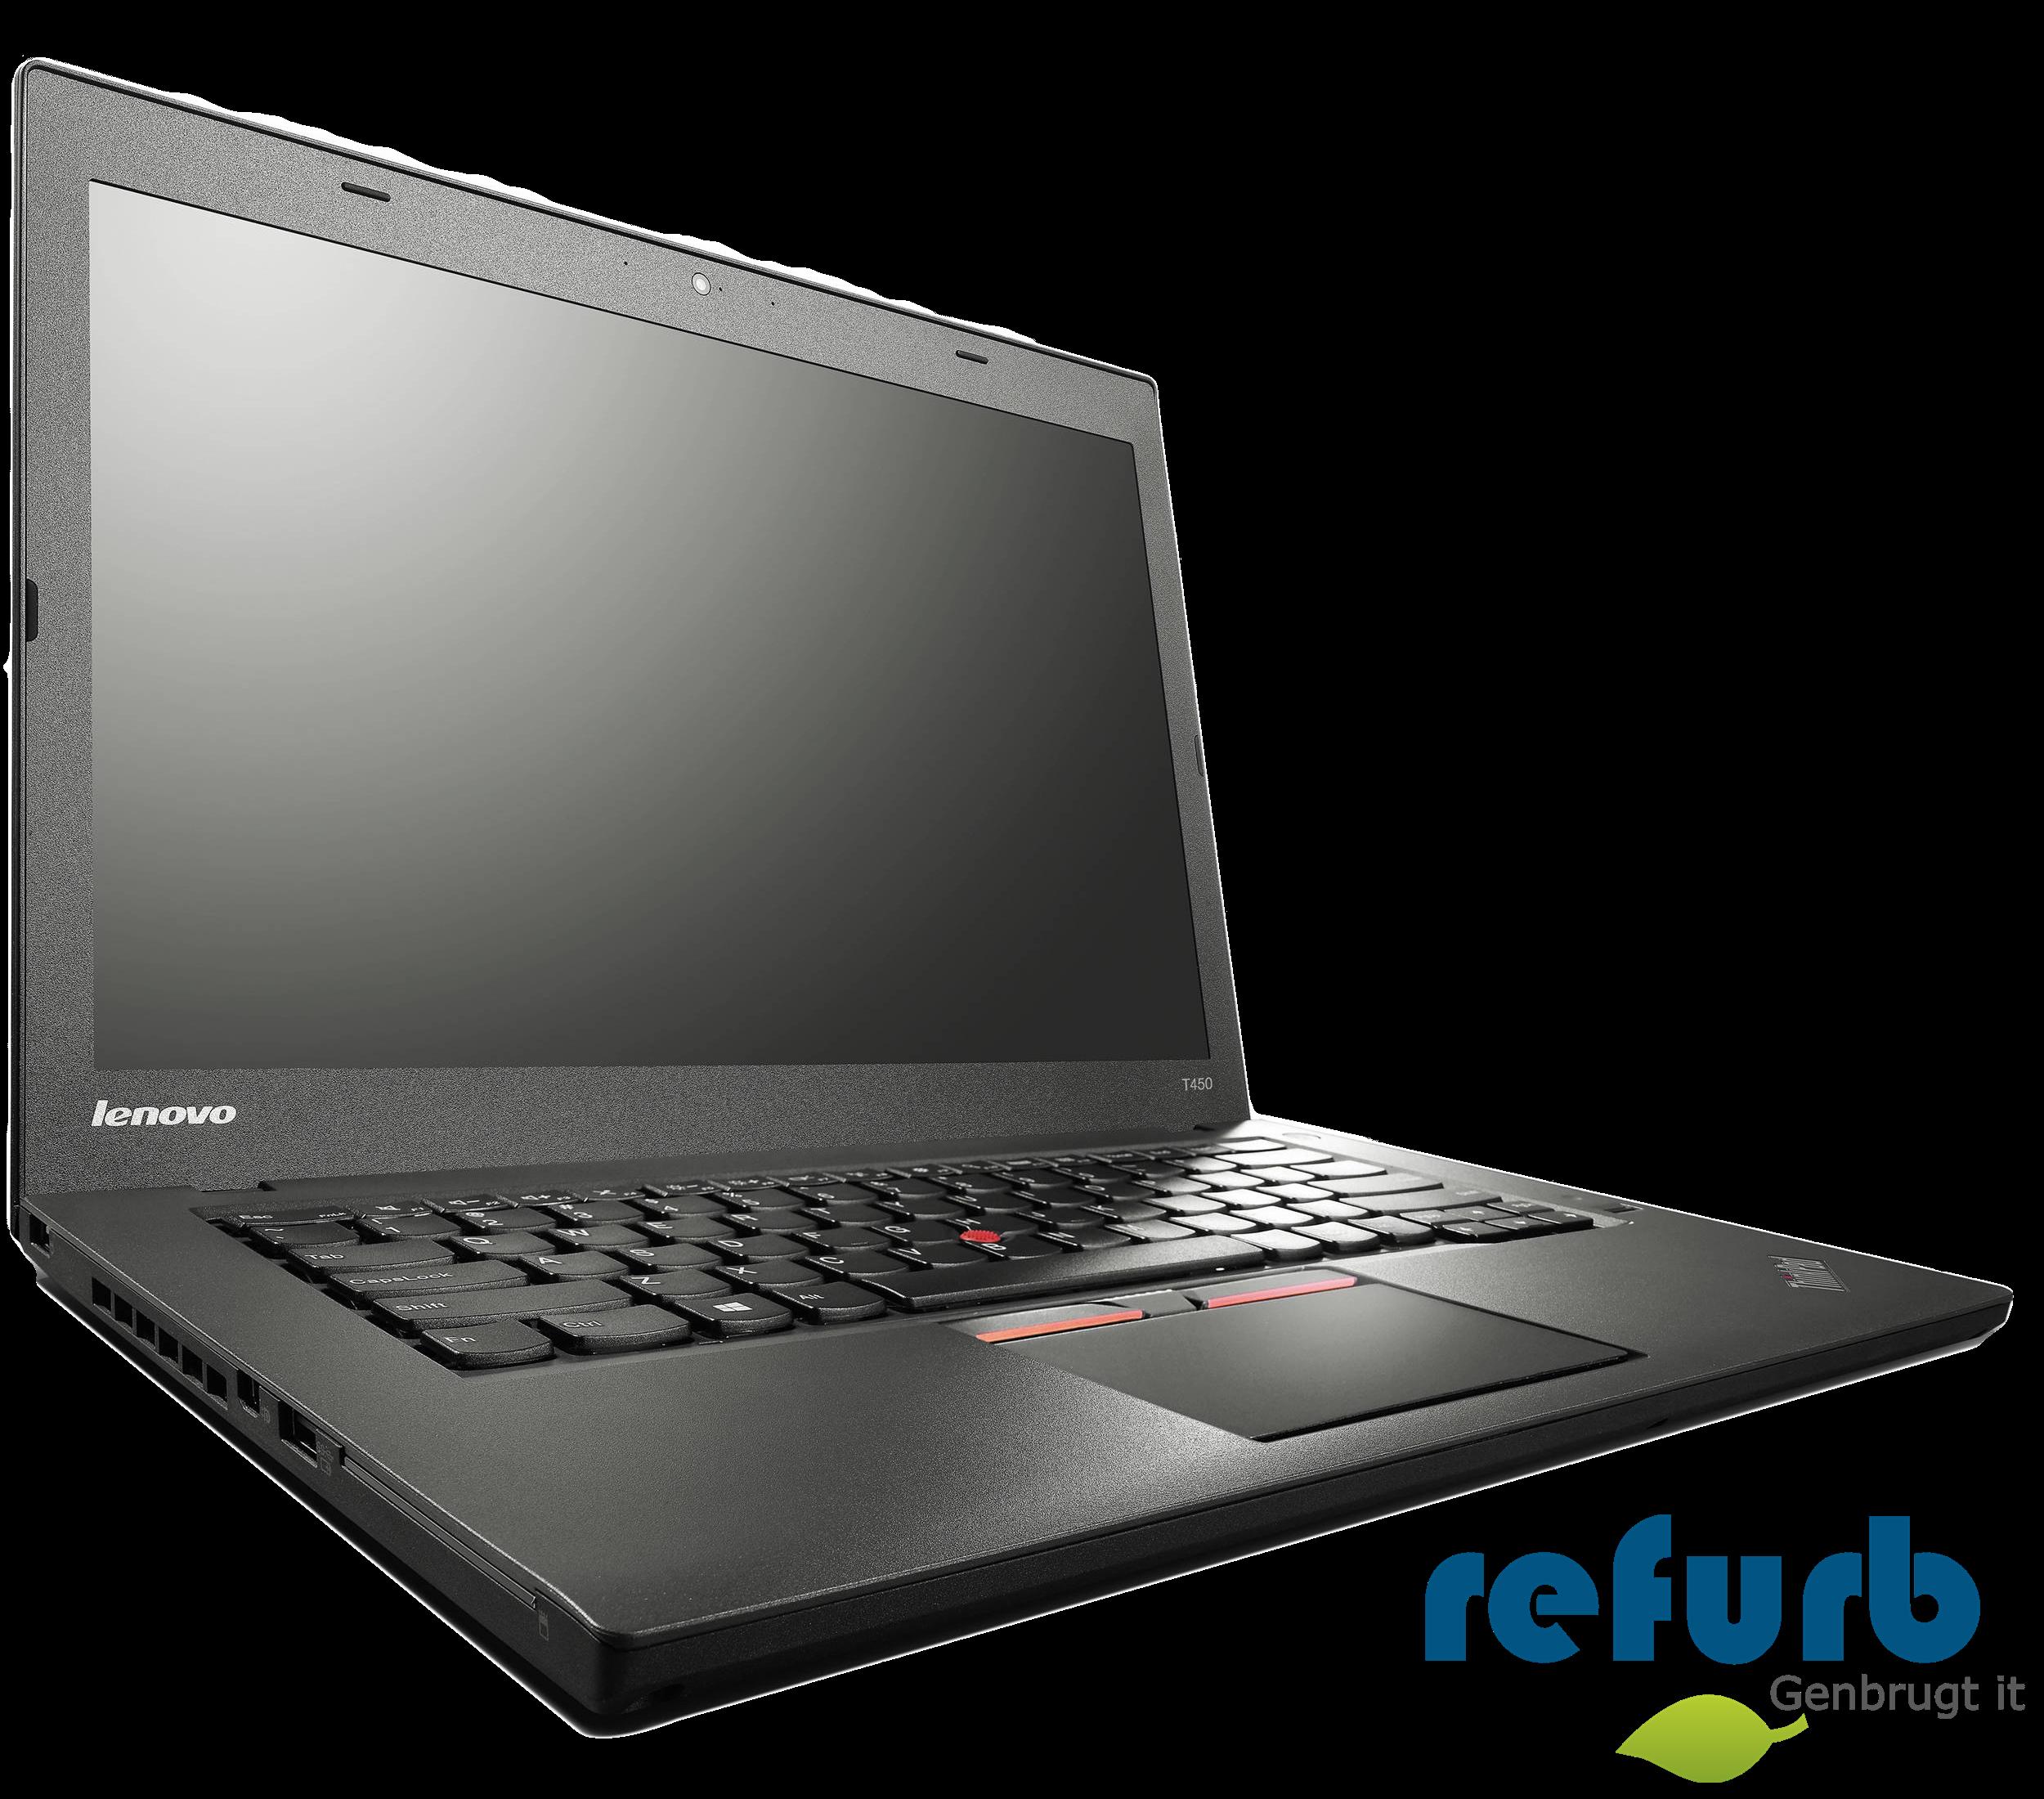 Lenovo Lenovo thinkpad t450 på refurb